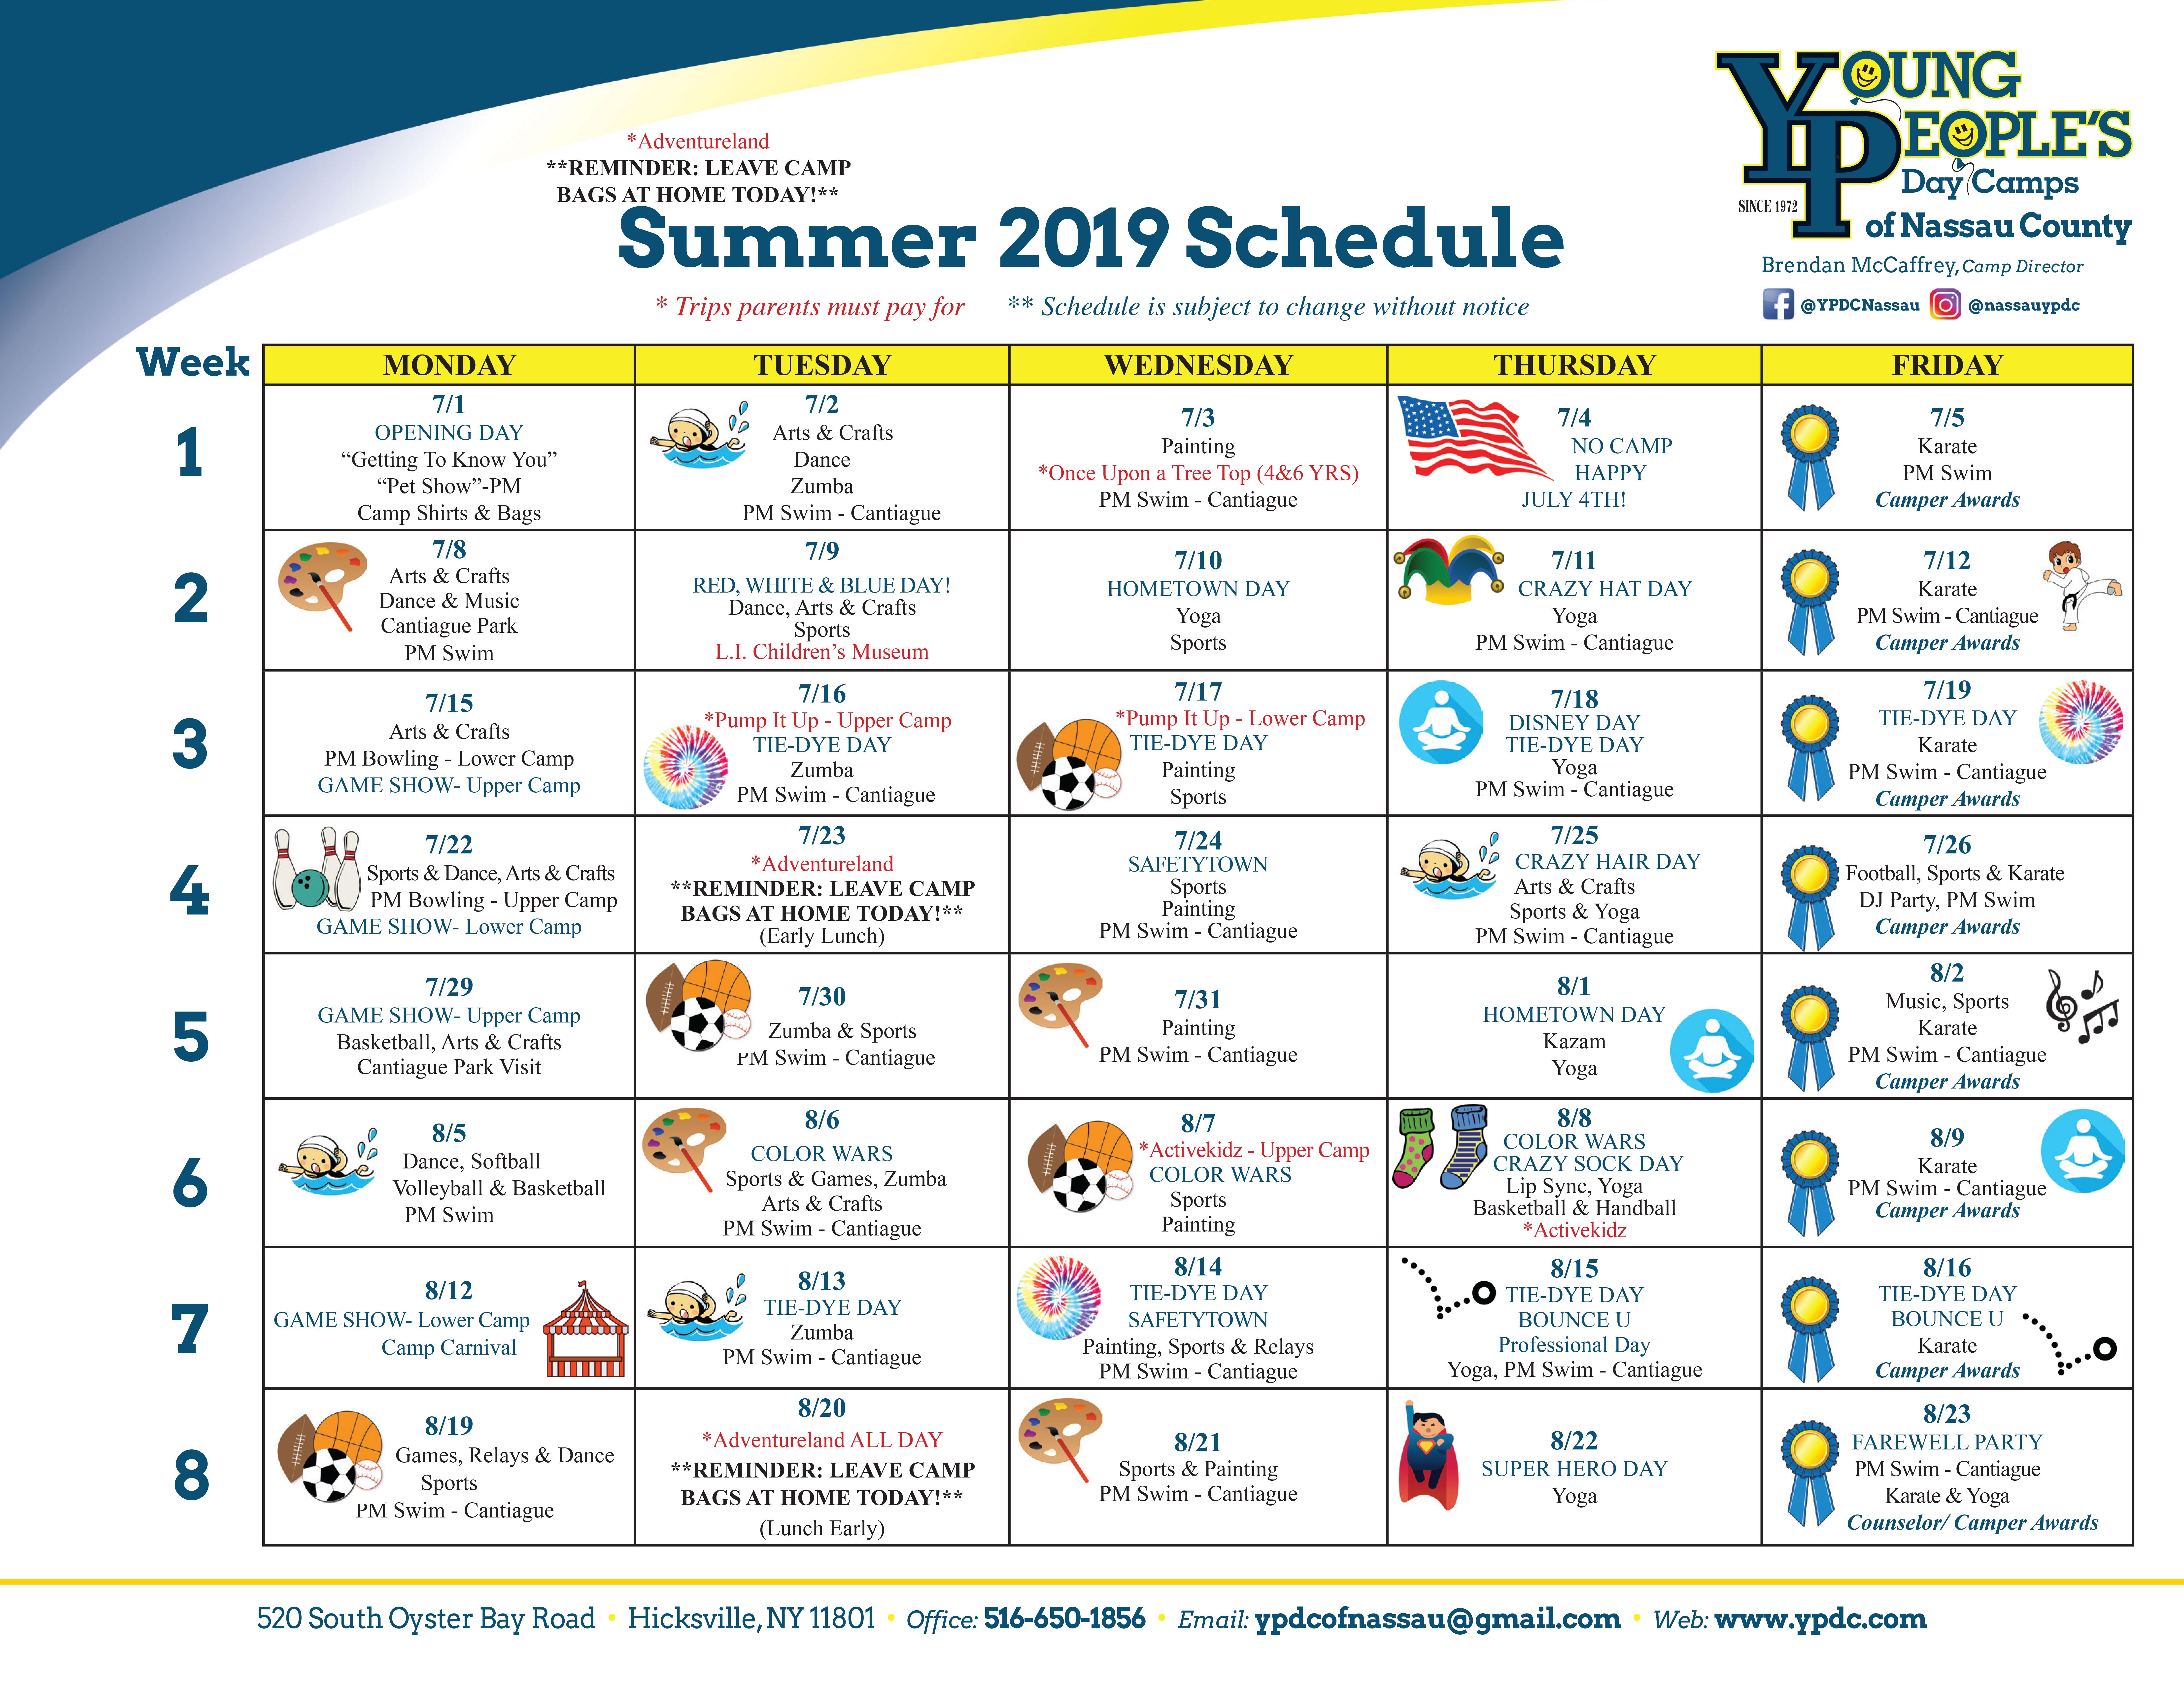 YPDC-0249-2019-Nassau-Calendar